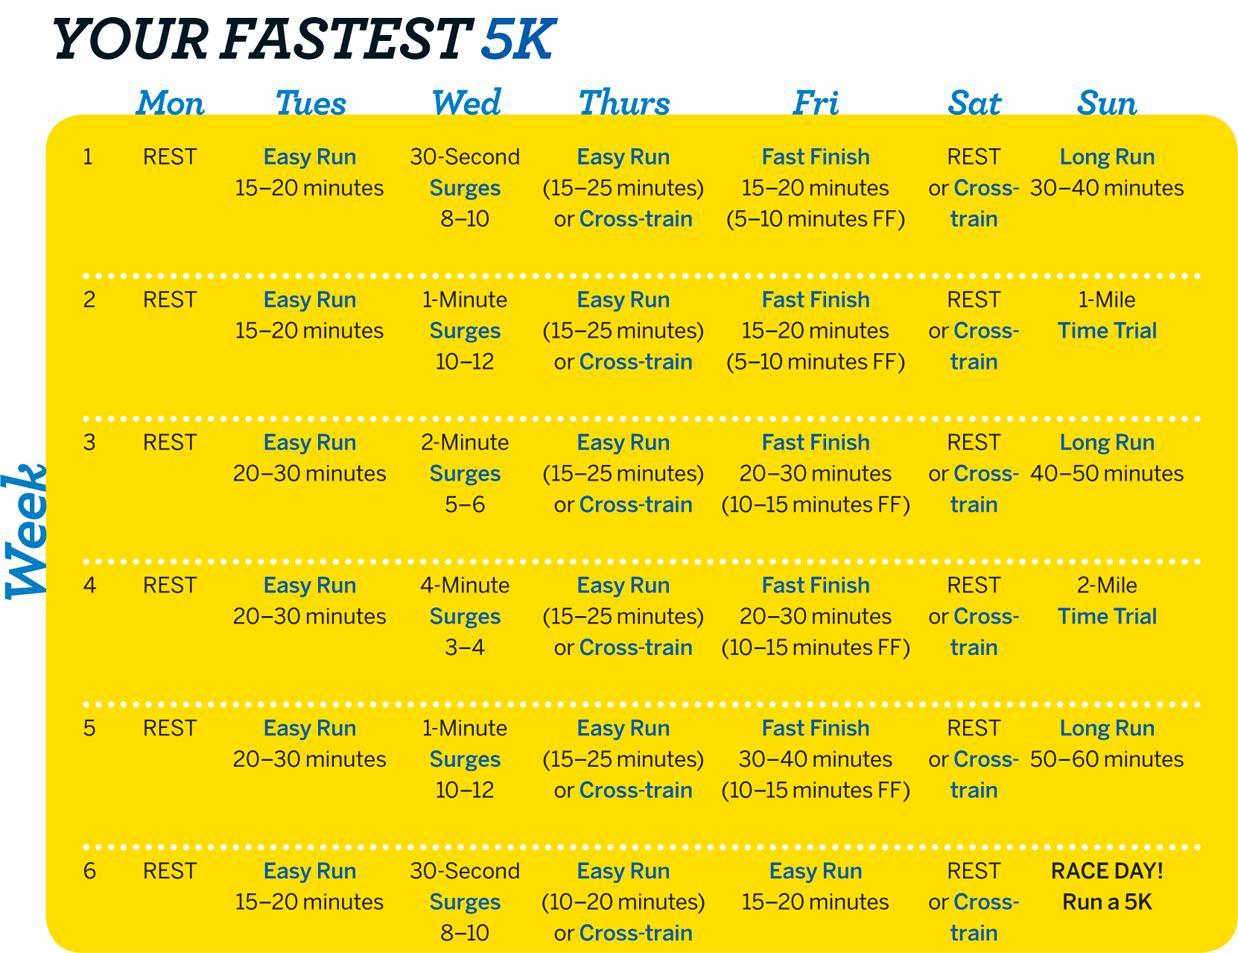 fastest5k-page-001.jpg